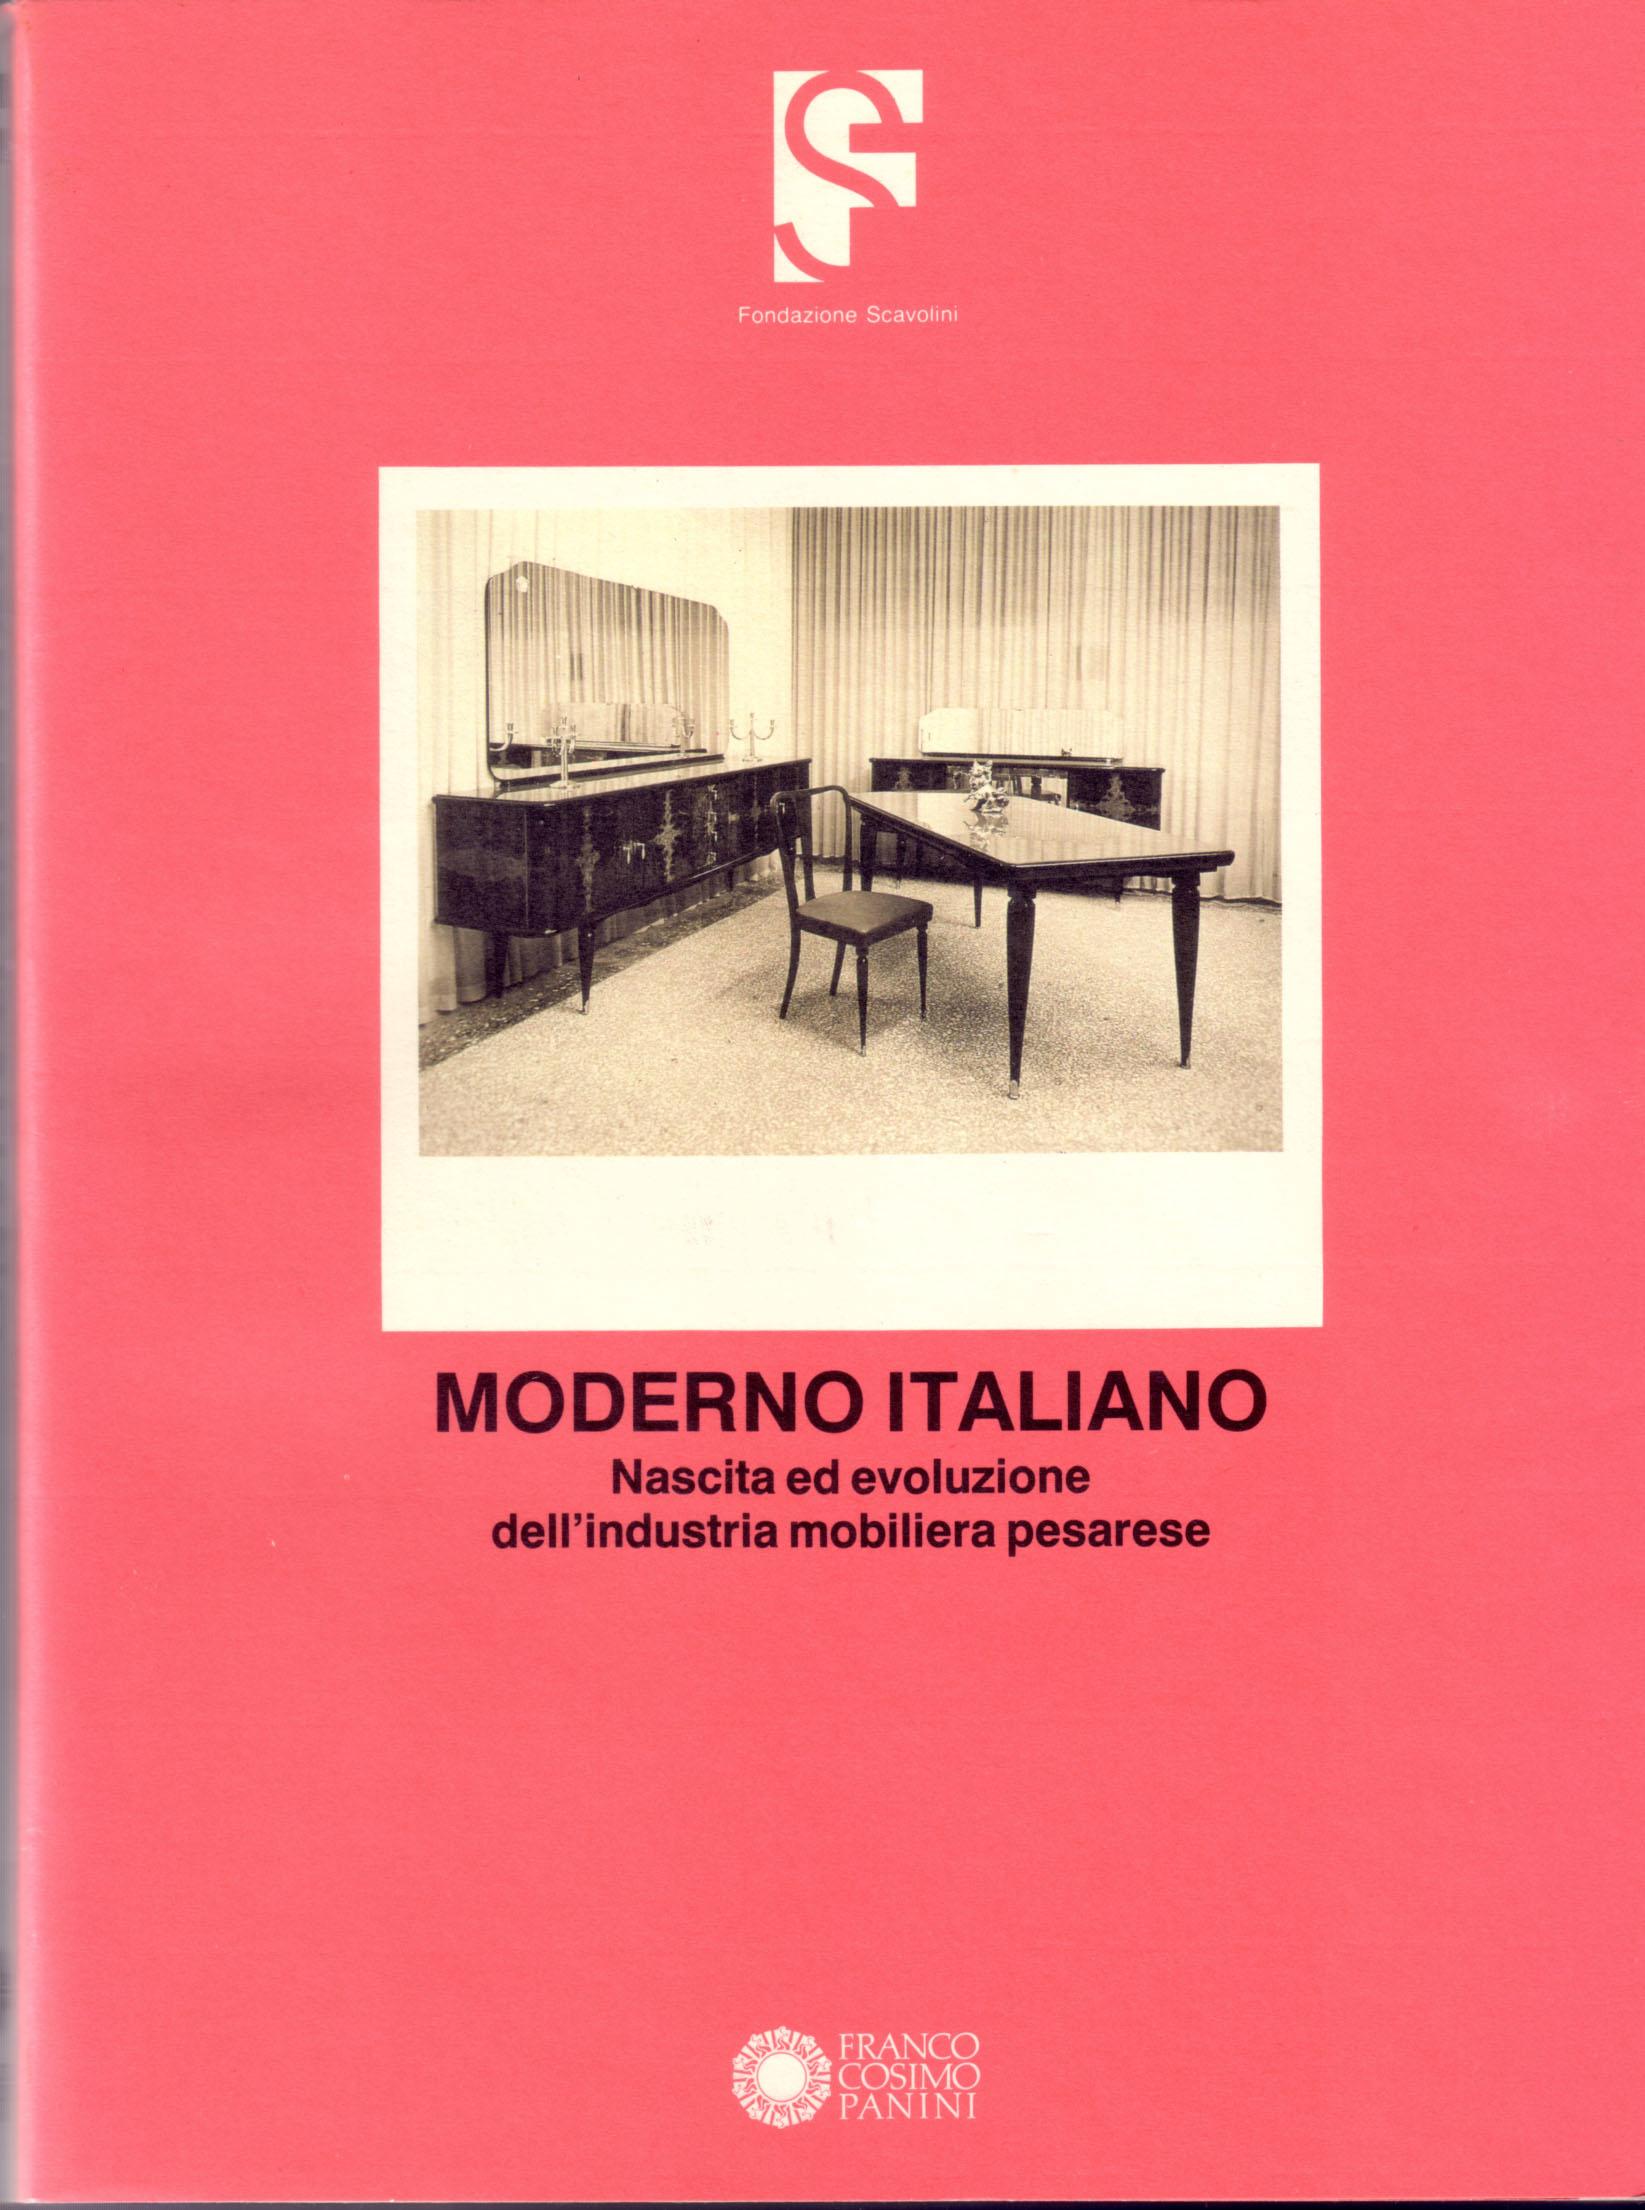 Moderno italiano